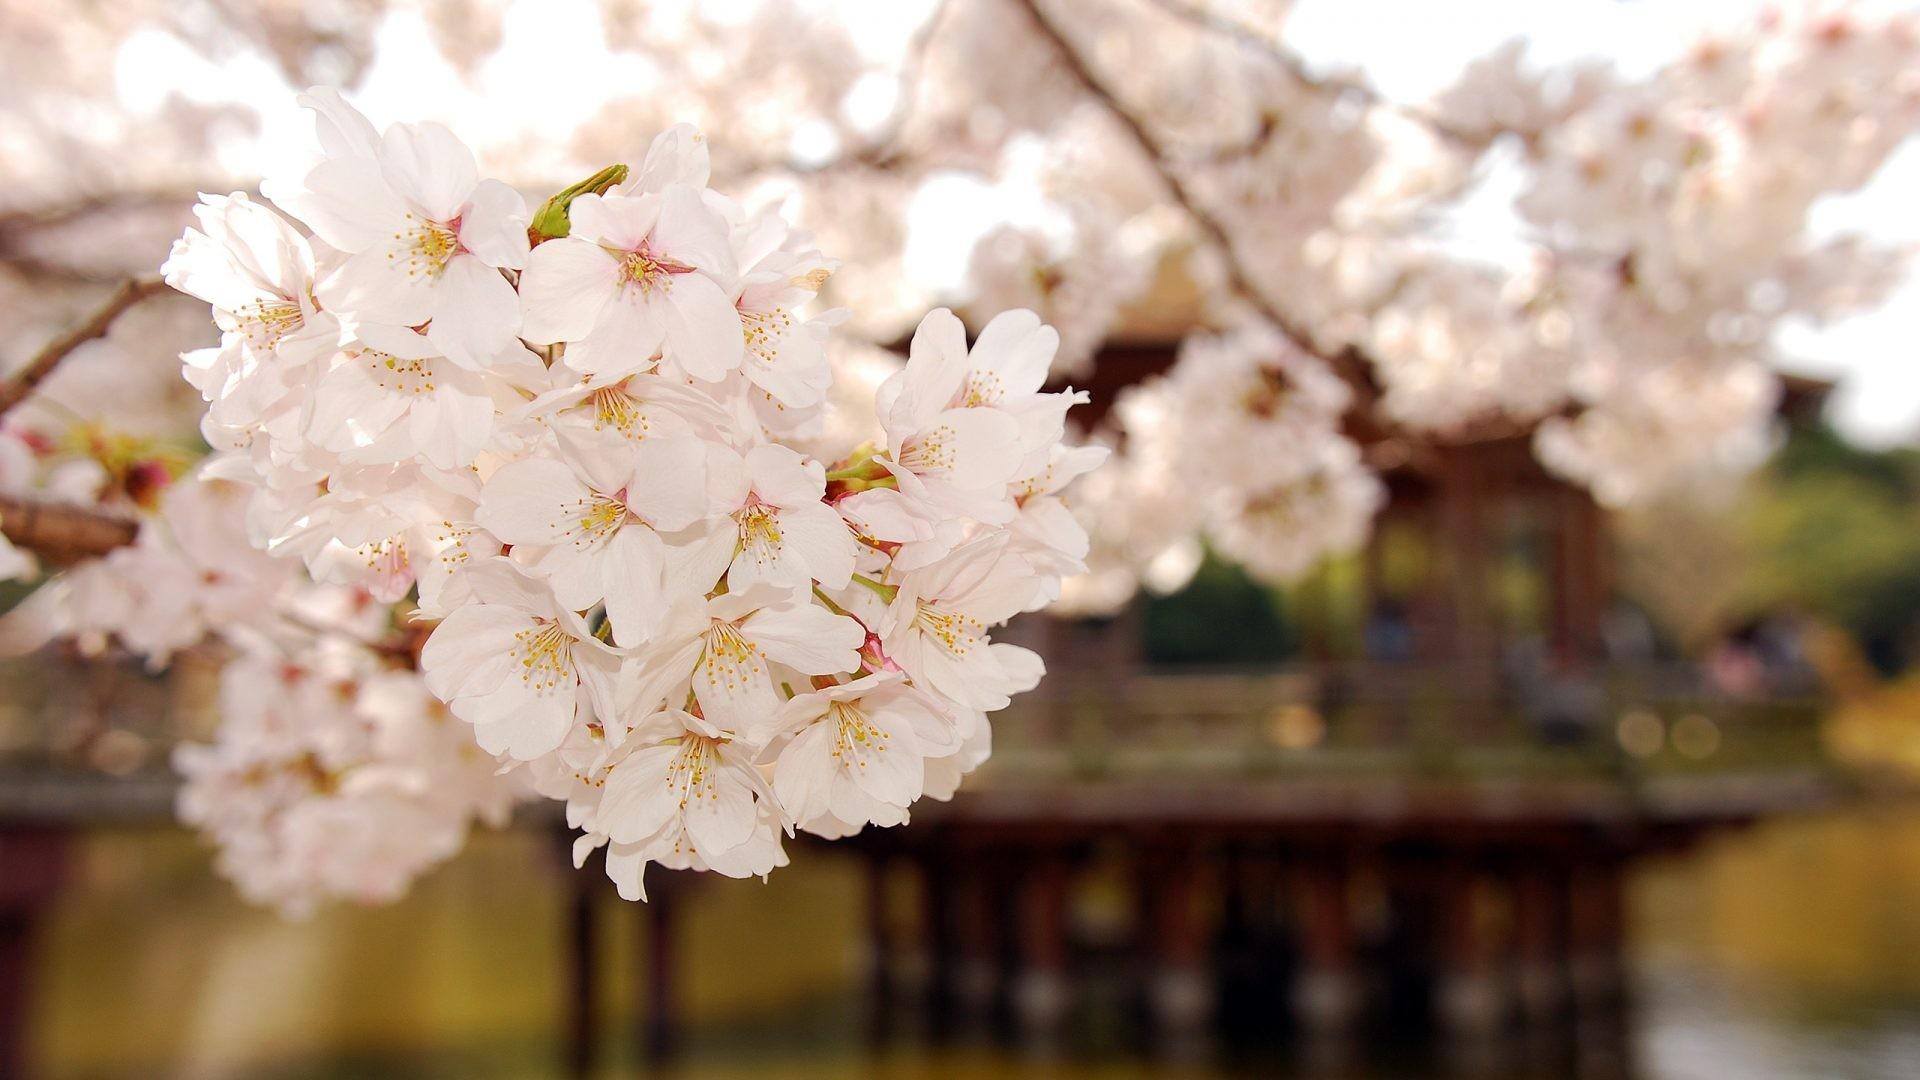 Japan Tag – Spring Japan Hd Nature Desktop Wallpapers Free Download for HD  16:9